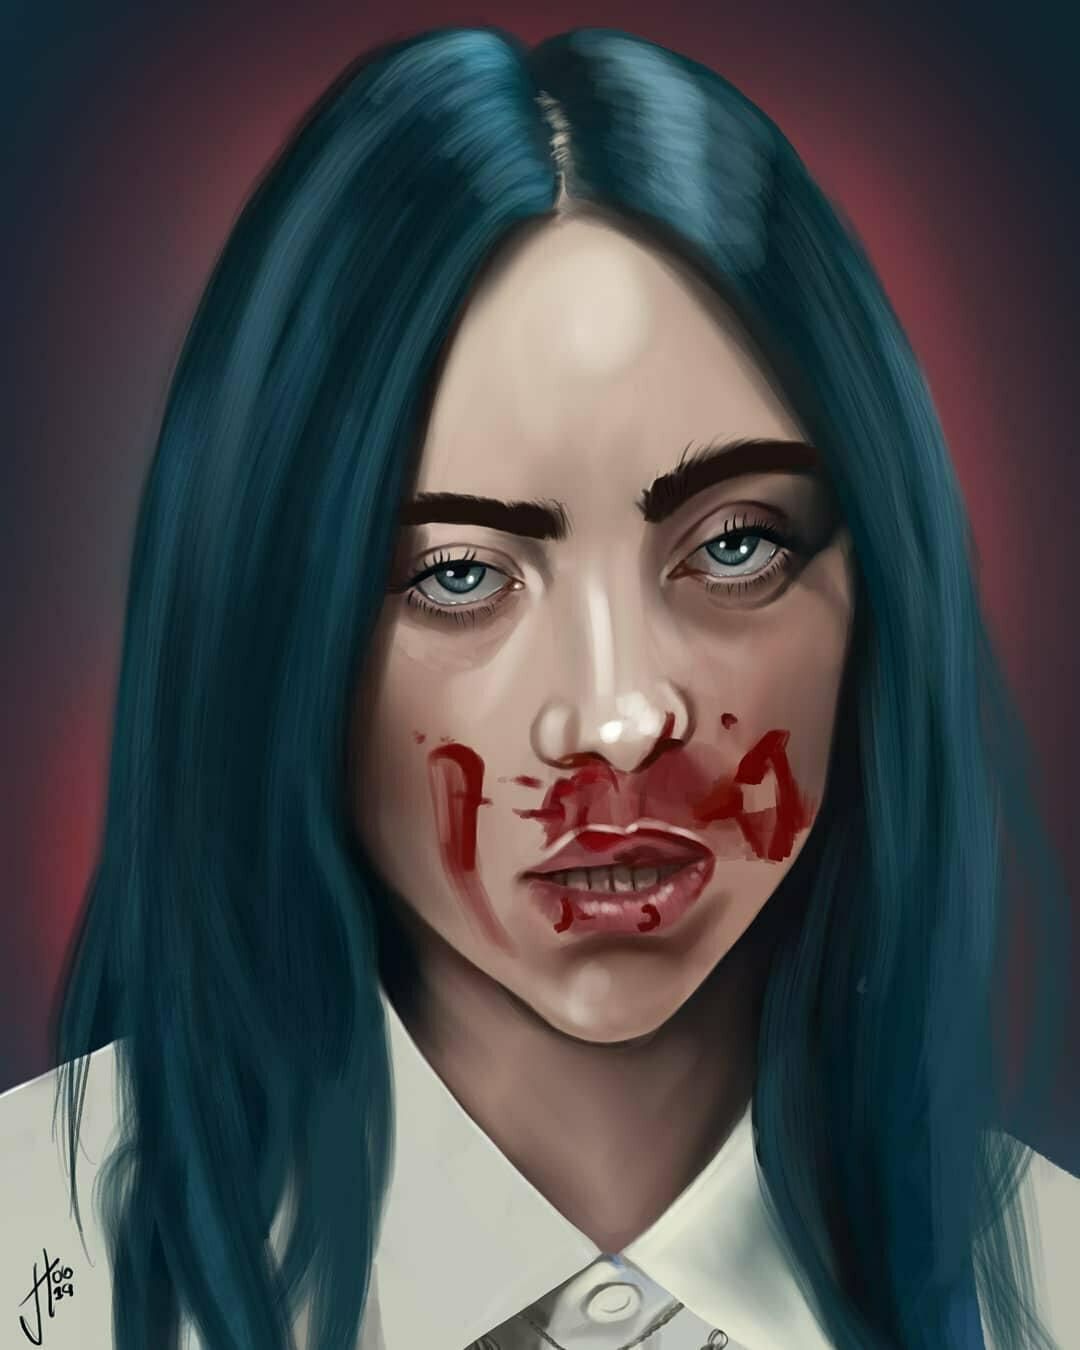 Billie Eilish Portrait Art Print